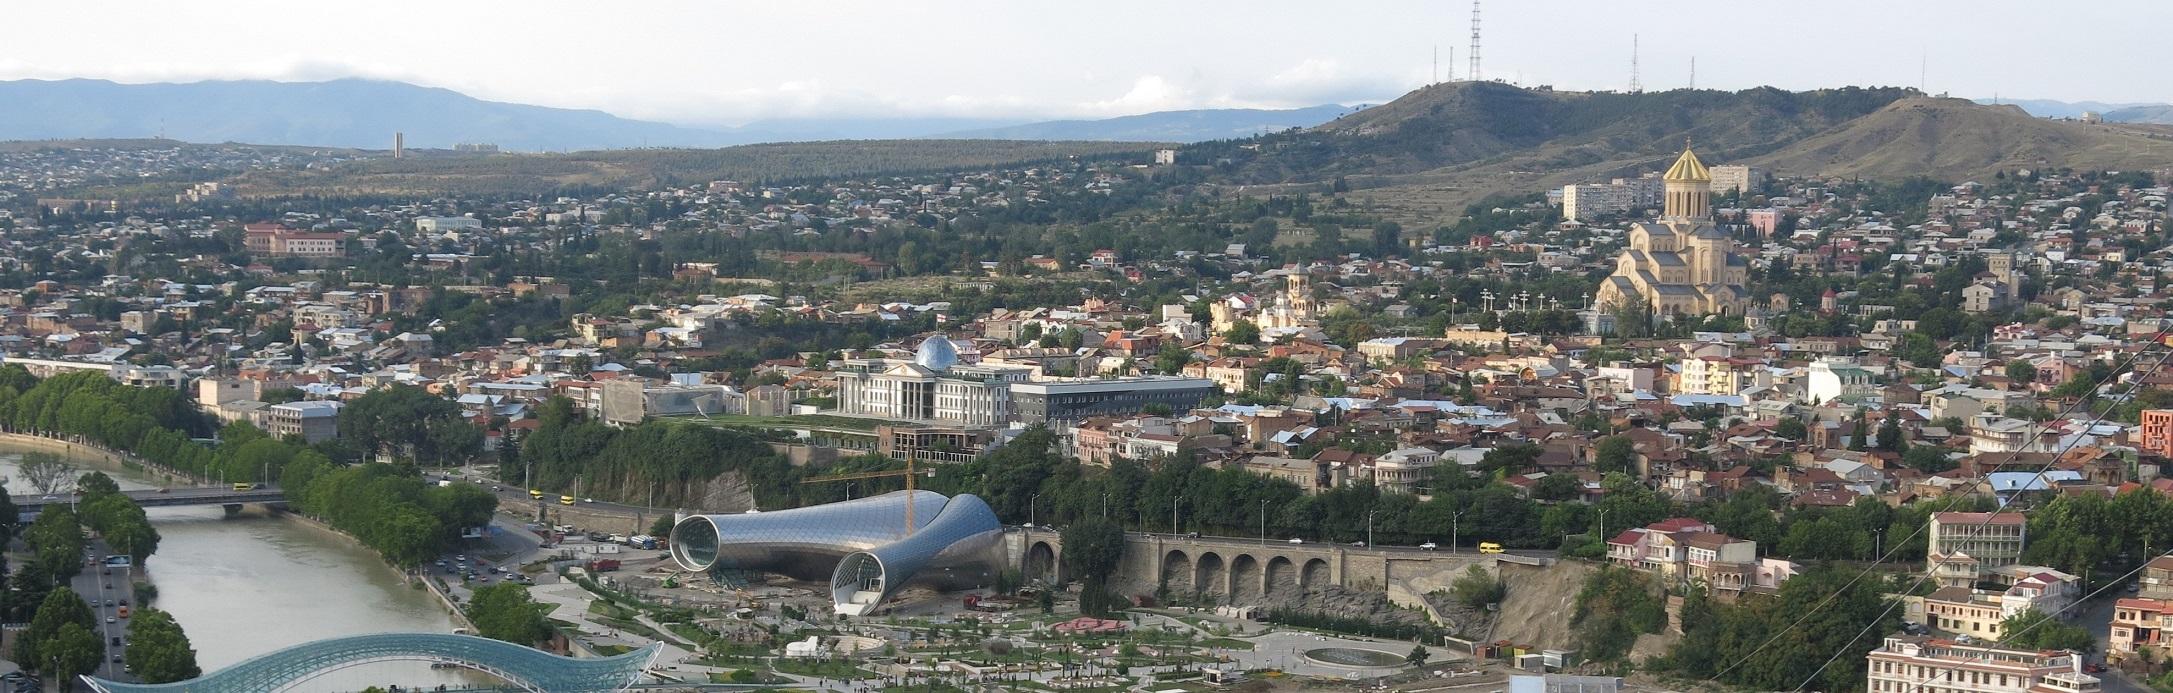 georgie tbilisi